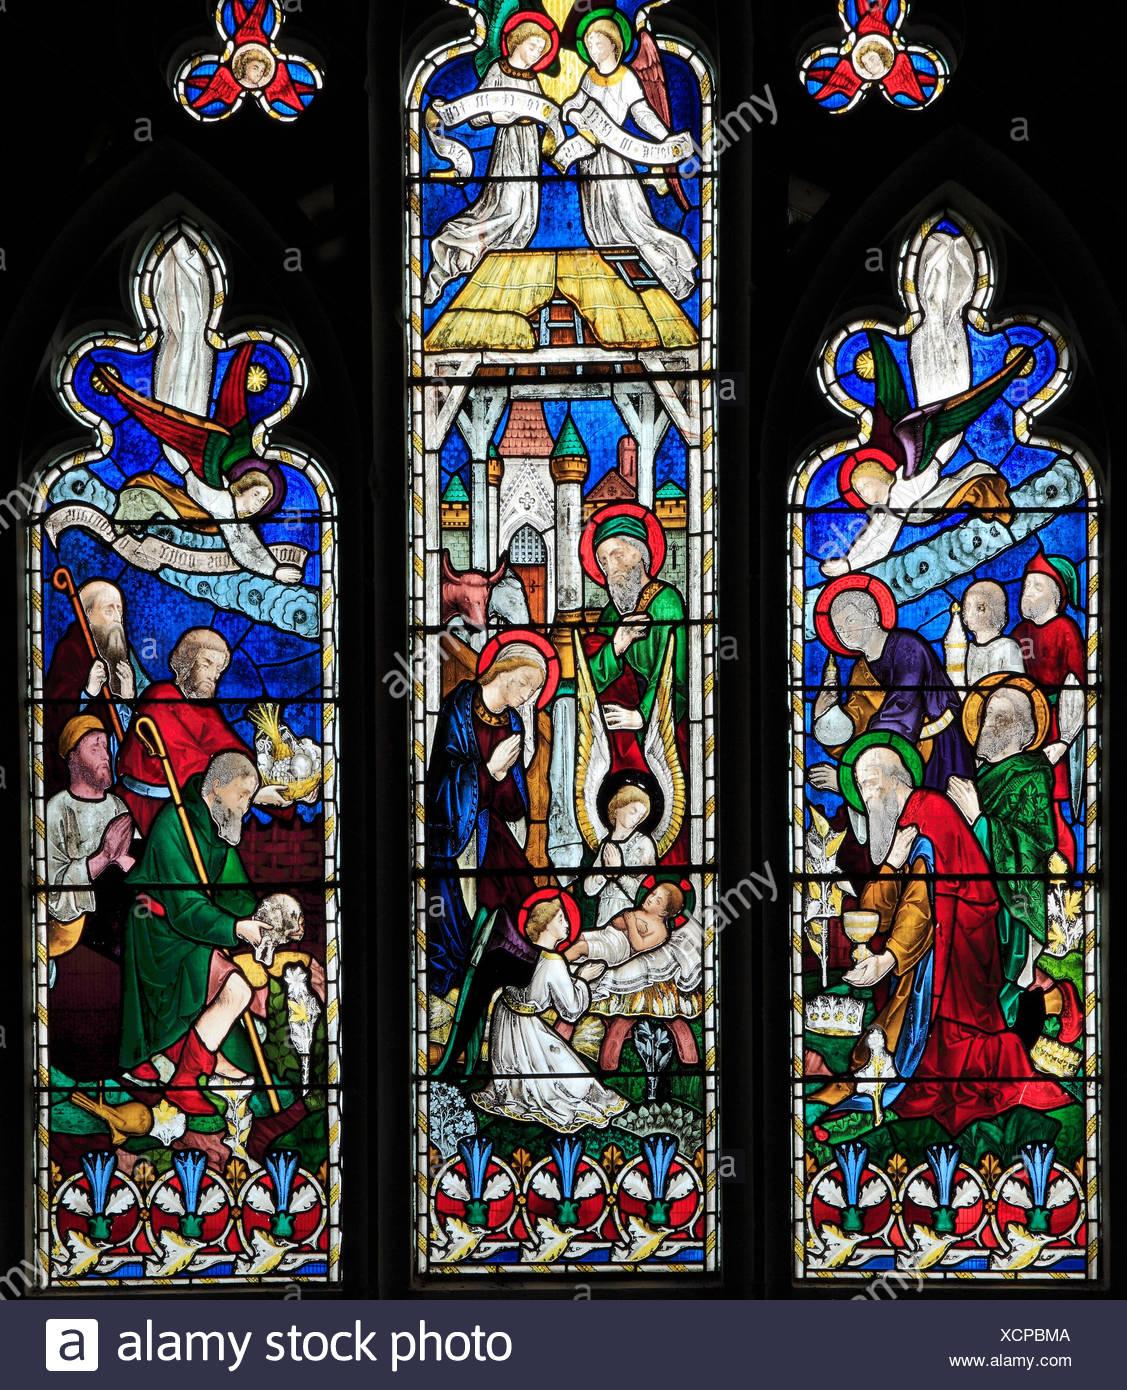 Nativity, stained glass window, by J. Hardman & Co, the Magi, Shepherds, infant baby Jesus, stable, Hillington, Norfolk, England, UK - Stock Image